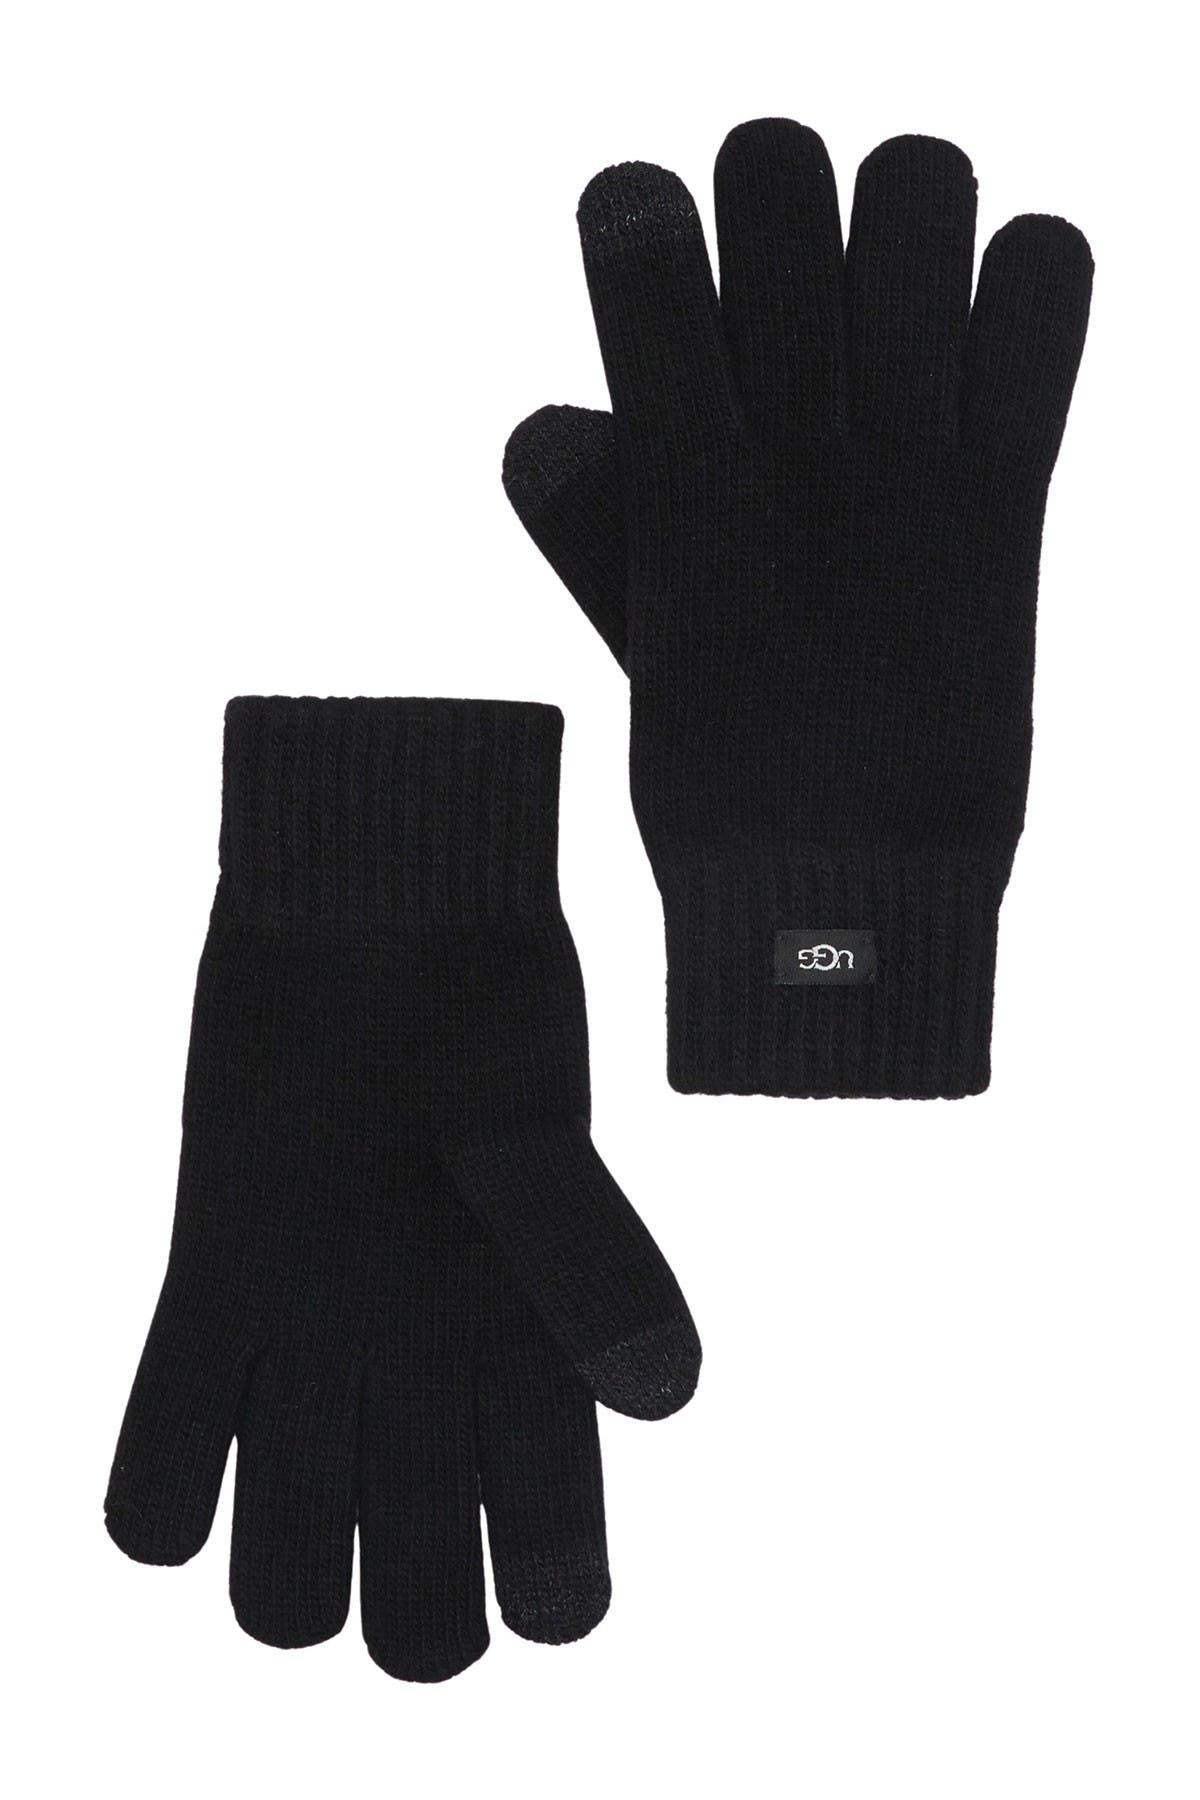 Image of UGG Knit Tech Gloves